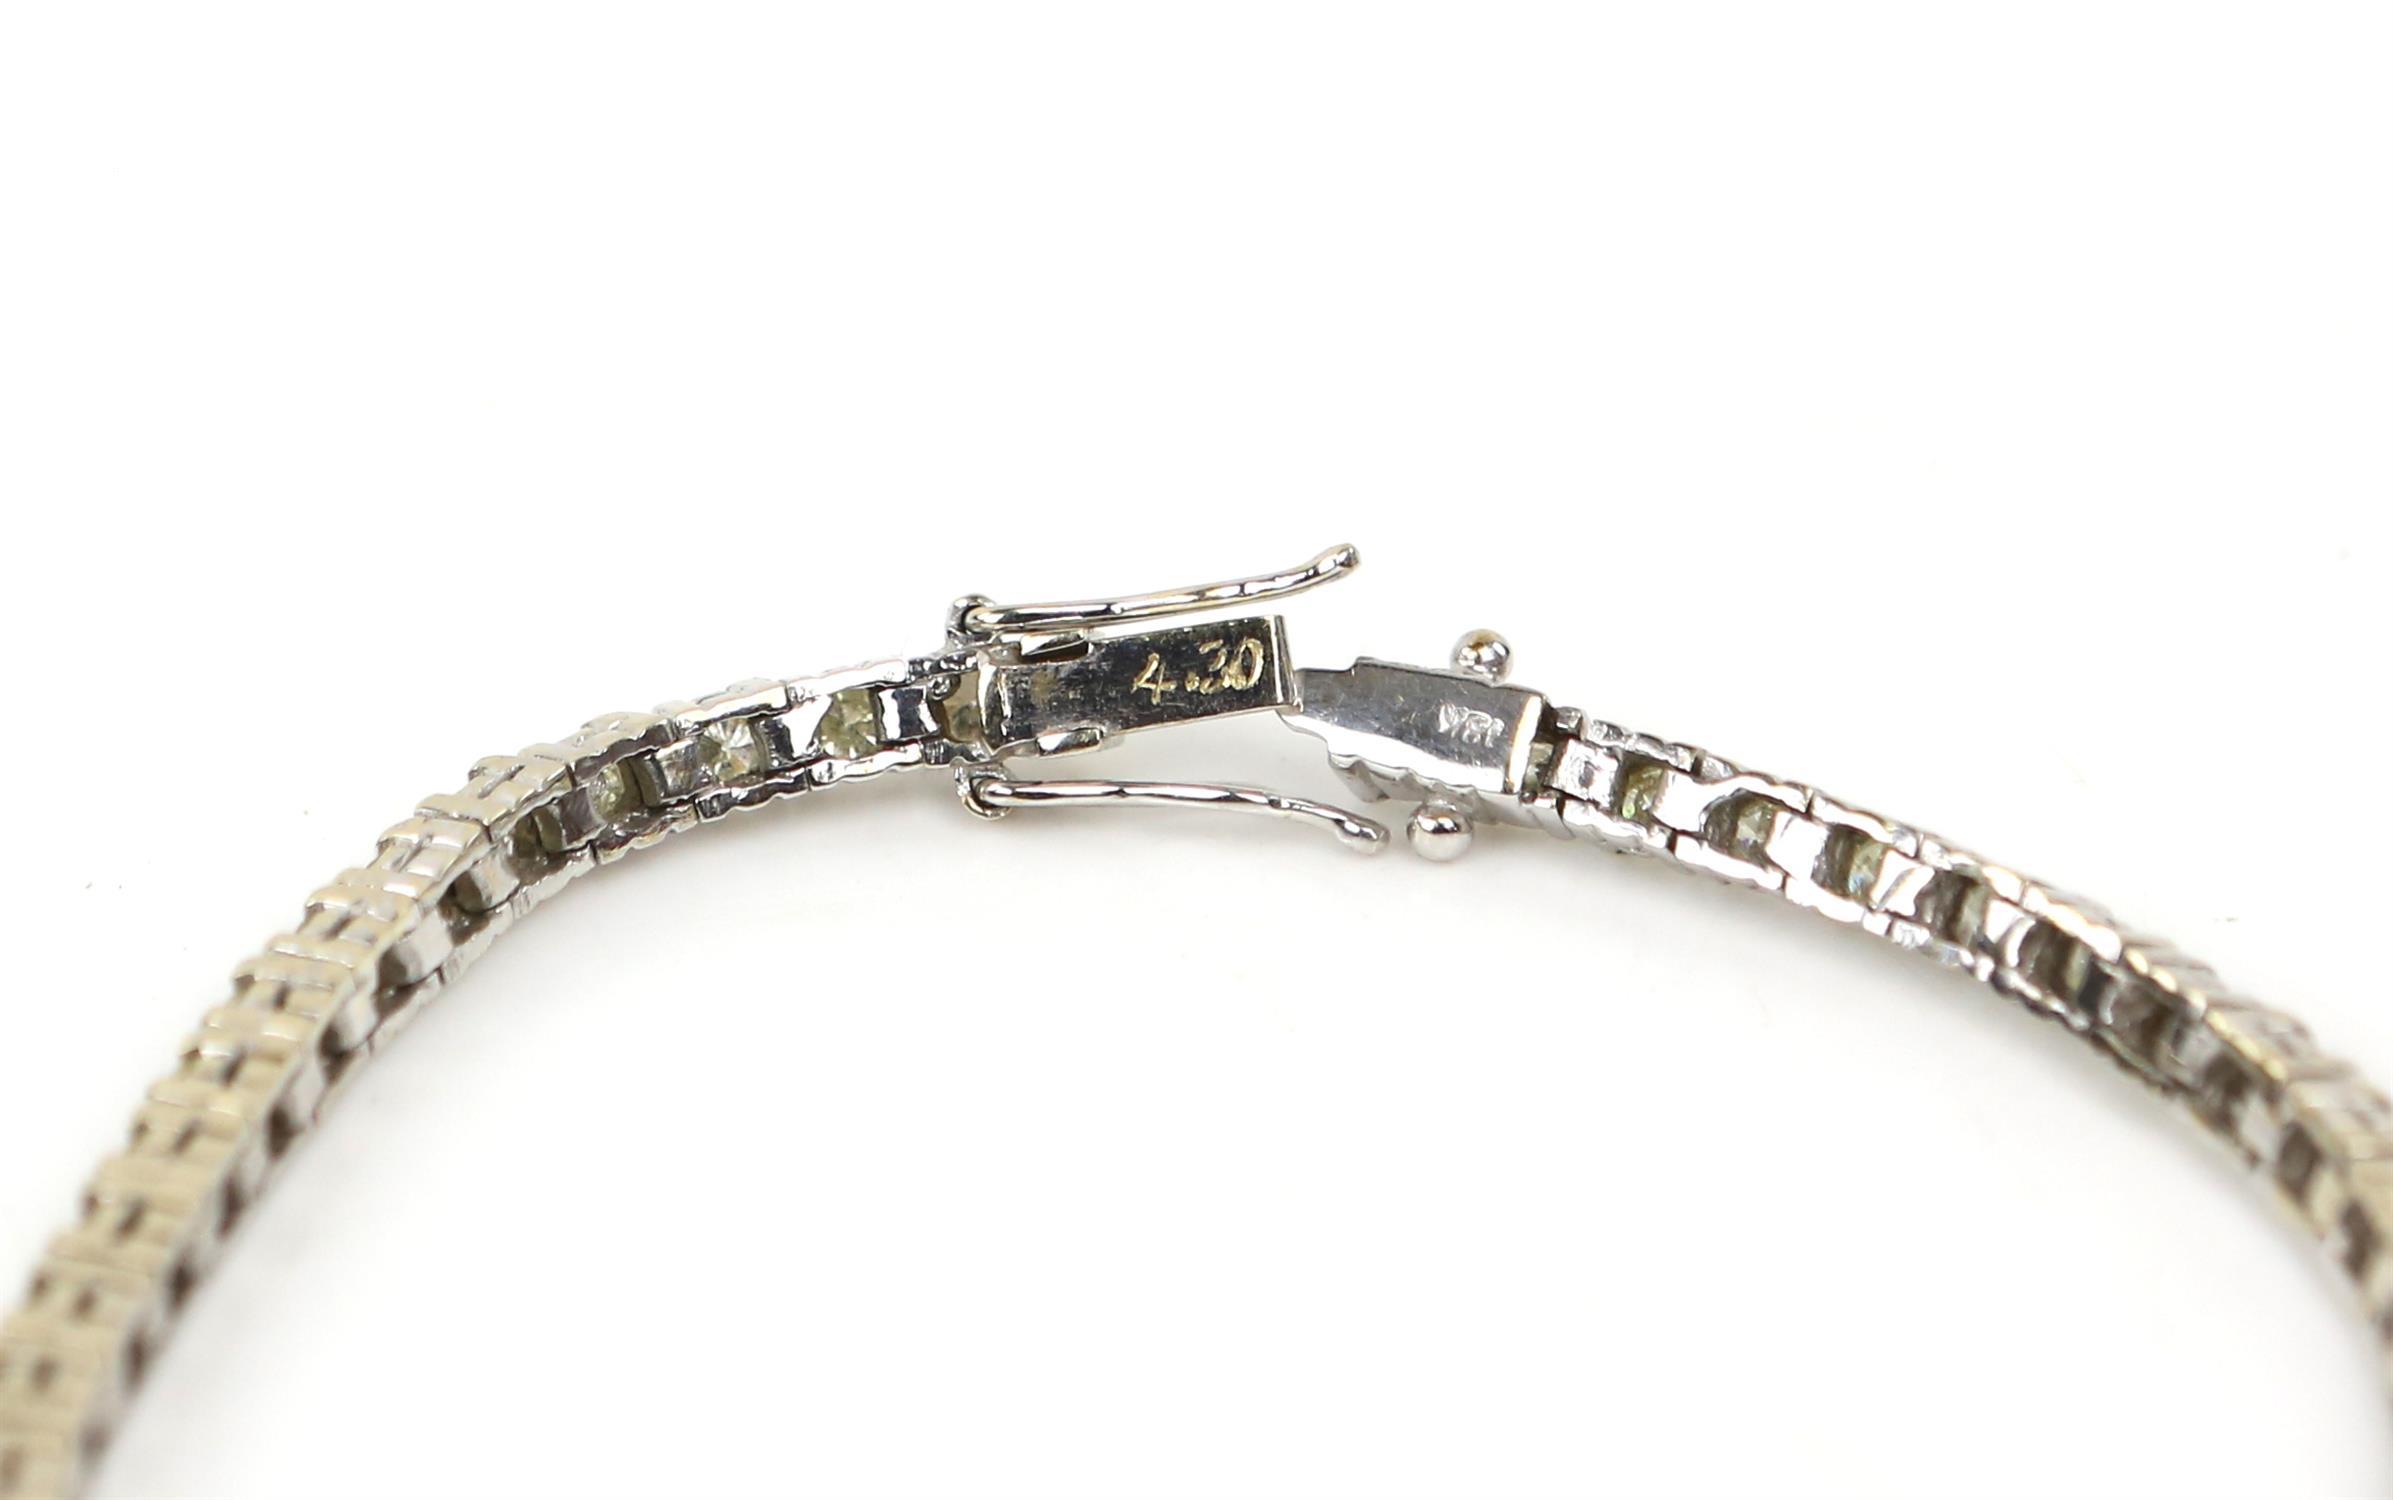 Diamond line bracelet, set with round brilliant cut diamonds, estimated total diamond weight 3. - Image 5 of 6